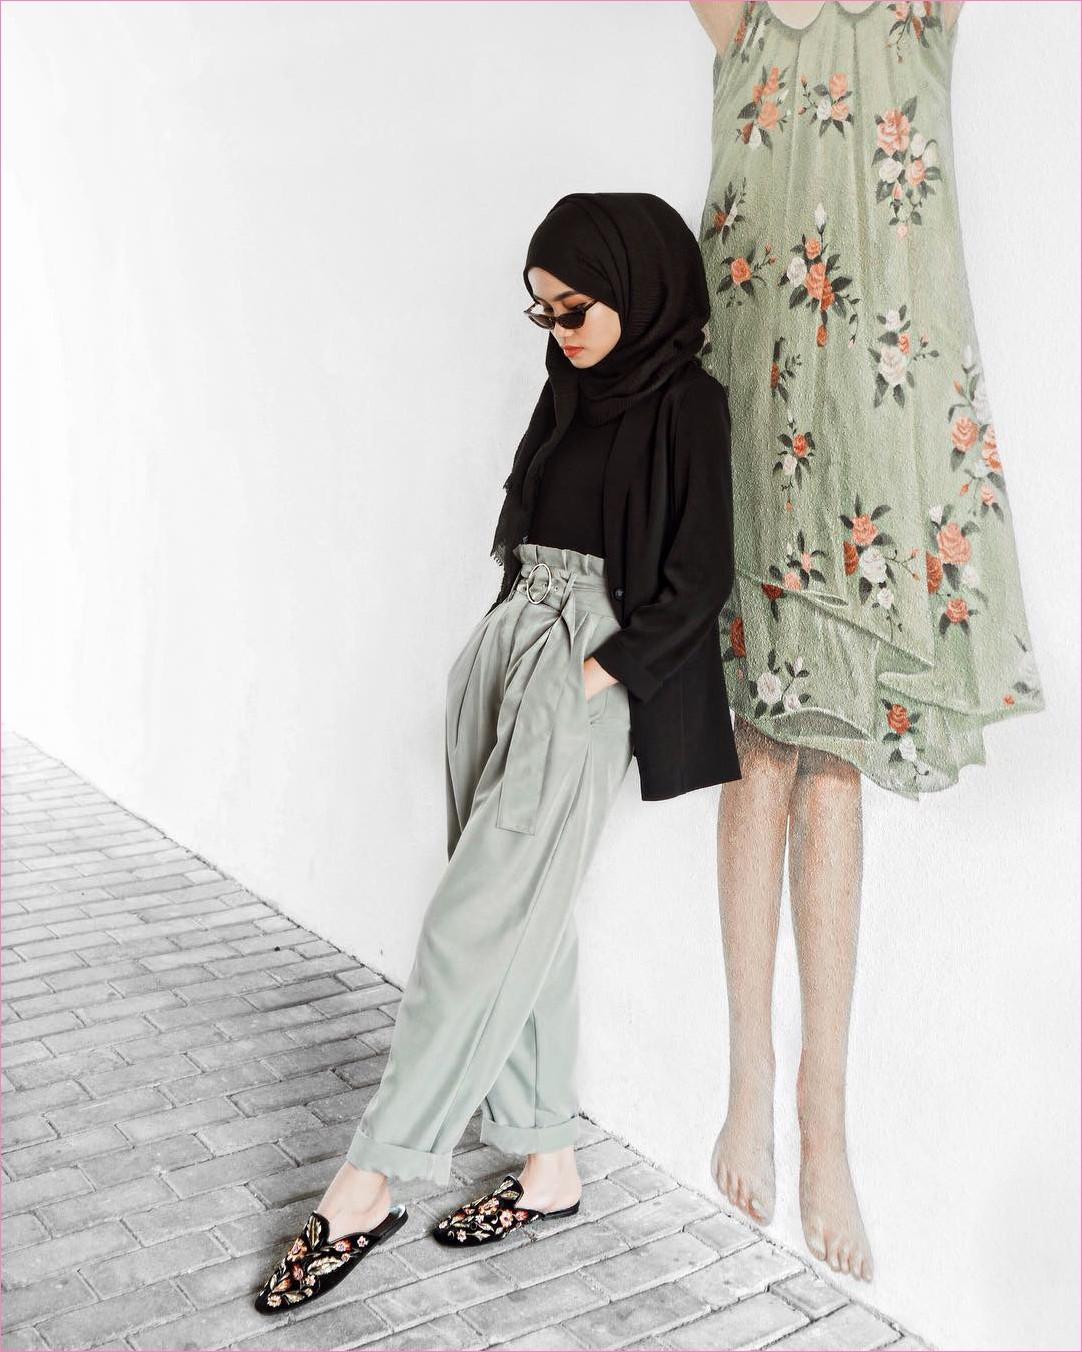 Outfit Kerudung Pashmina Ala Selebgram 2018 hijab pashmina rawis blazer outer mangset hitam loafers and slip ons flatshoes celana jogger pallazo abu ootd trendy kekinian hijabers kacamata